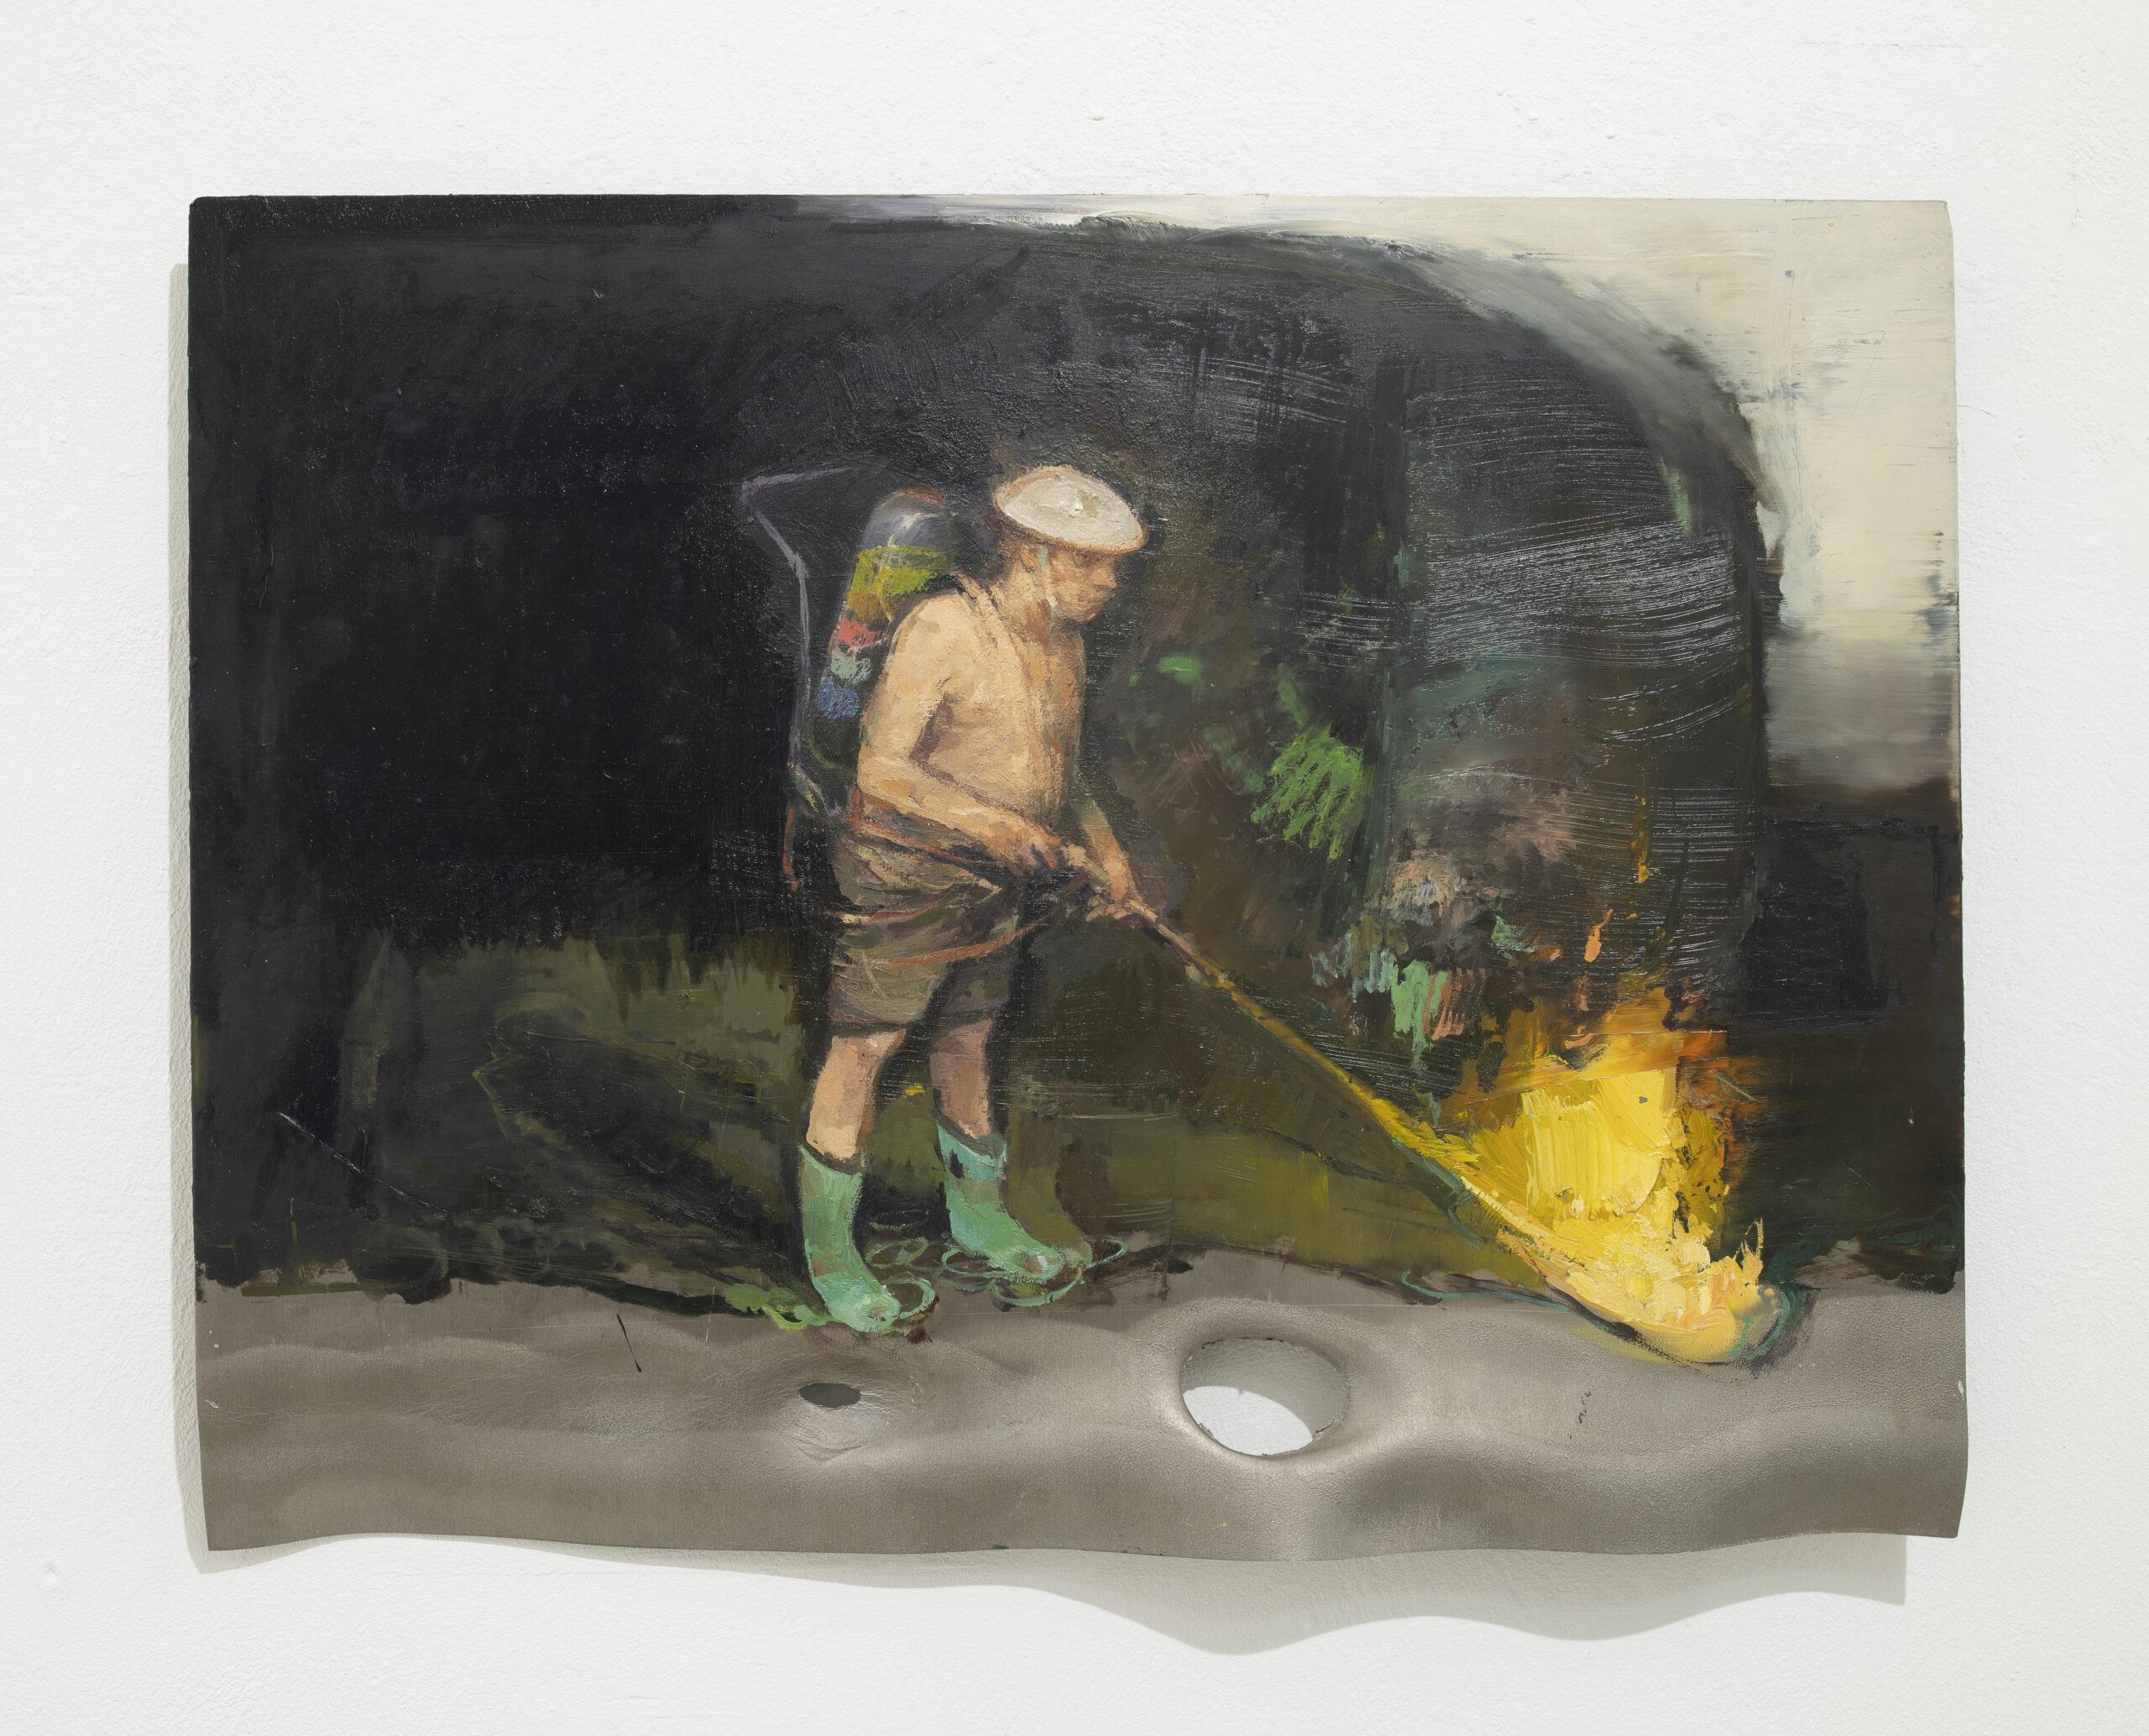 Klahres Feuer,2020, 40x50cm, Öl auf Alu